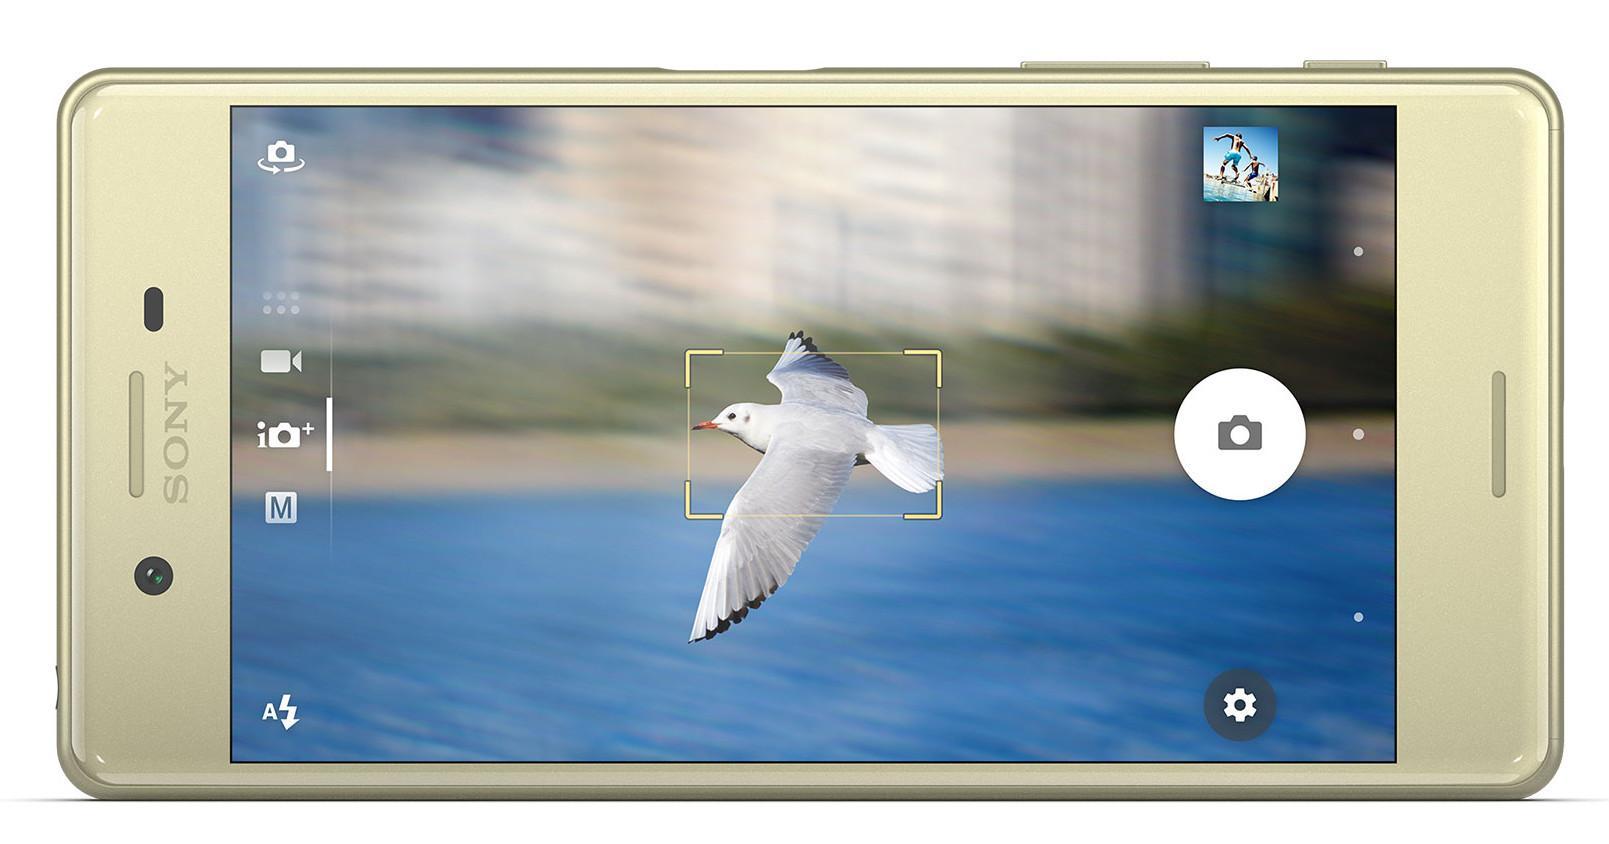 Sony Xperia X detalle de la cámara